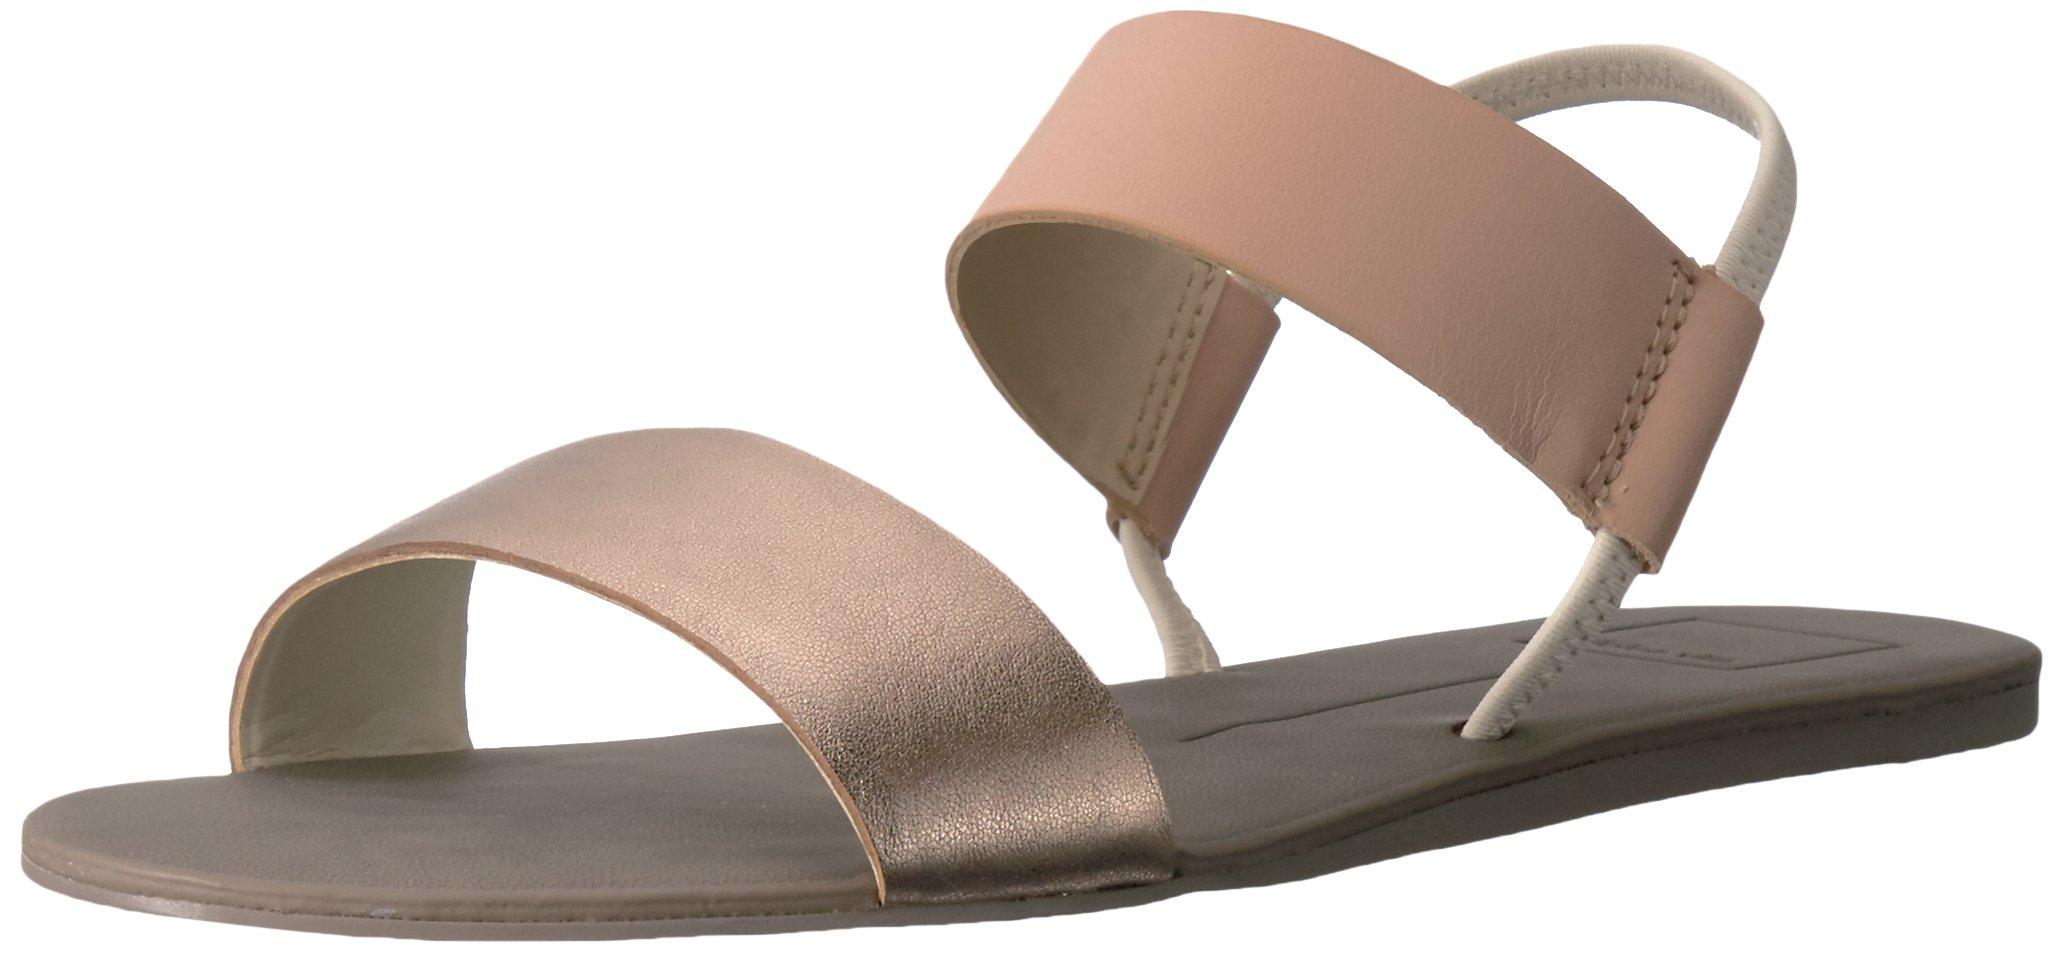 Dolce Vita Women's Demi Flat Sandal, Natural Multi Leather, 8.5 M US